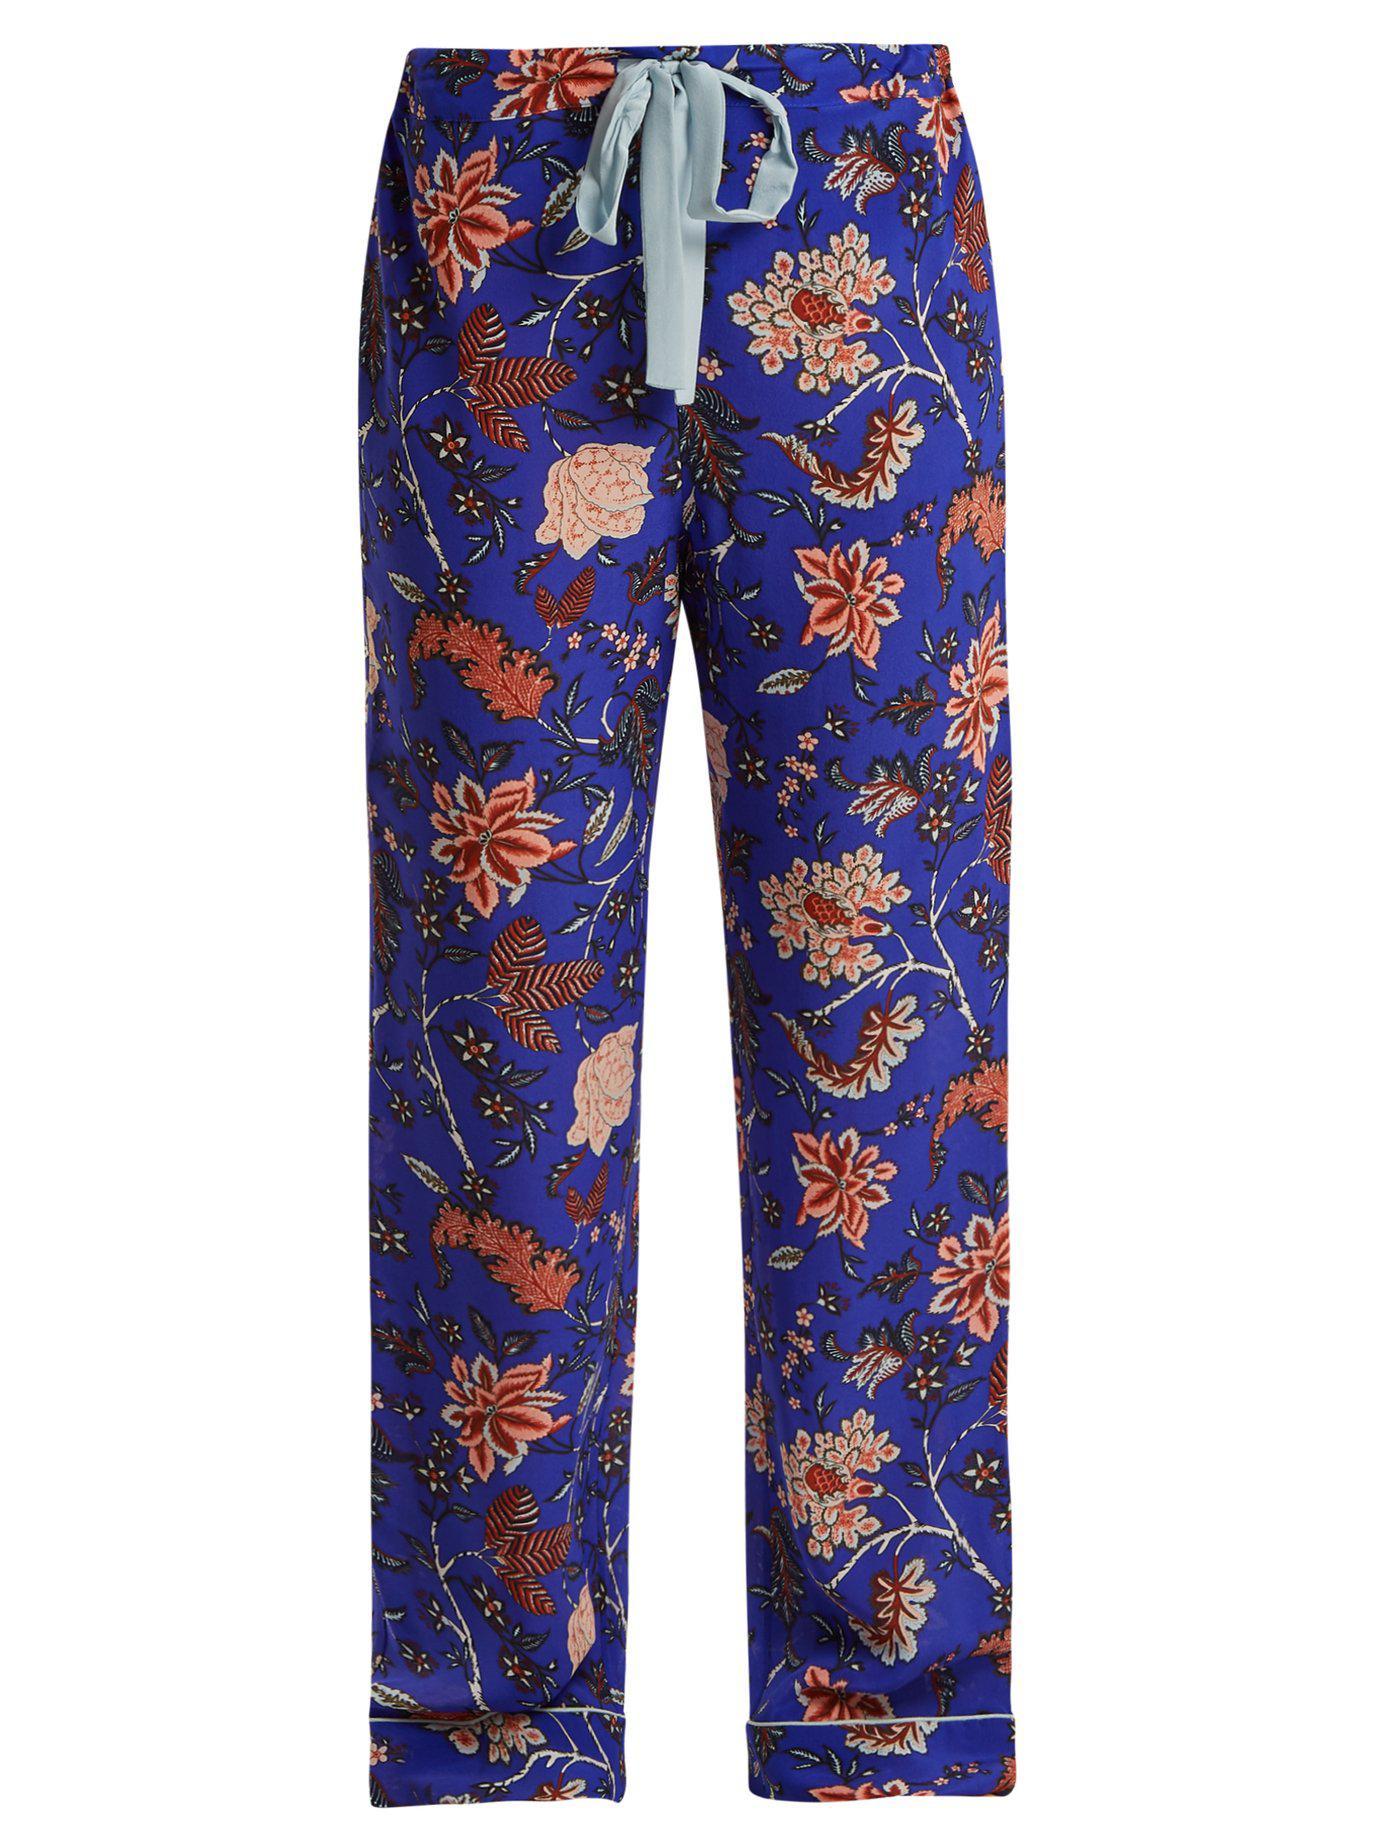 Diane von Furstenberg. Women s Blue Floral-print Silk Crepe De Chine Pyjama  Trousers 3f68d0aac